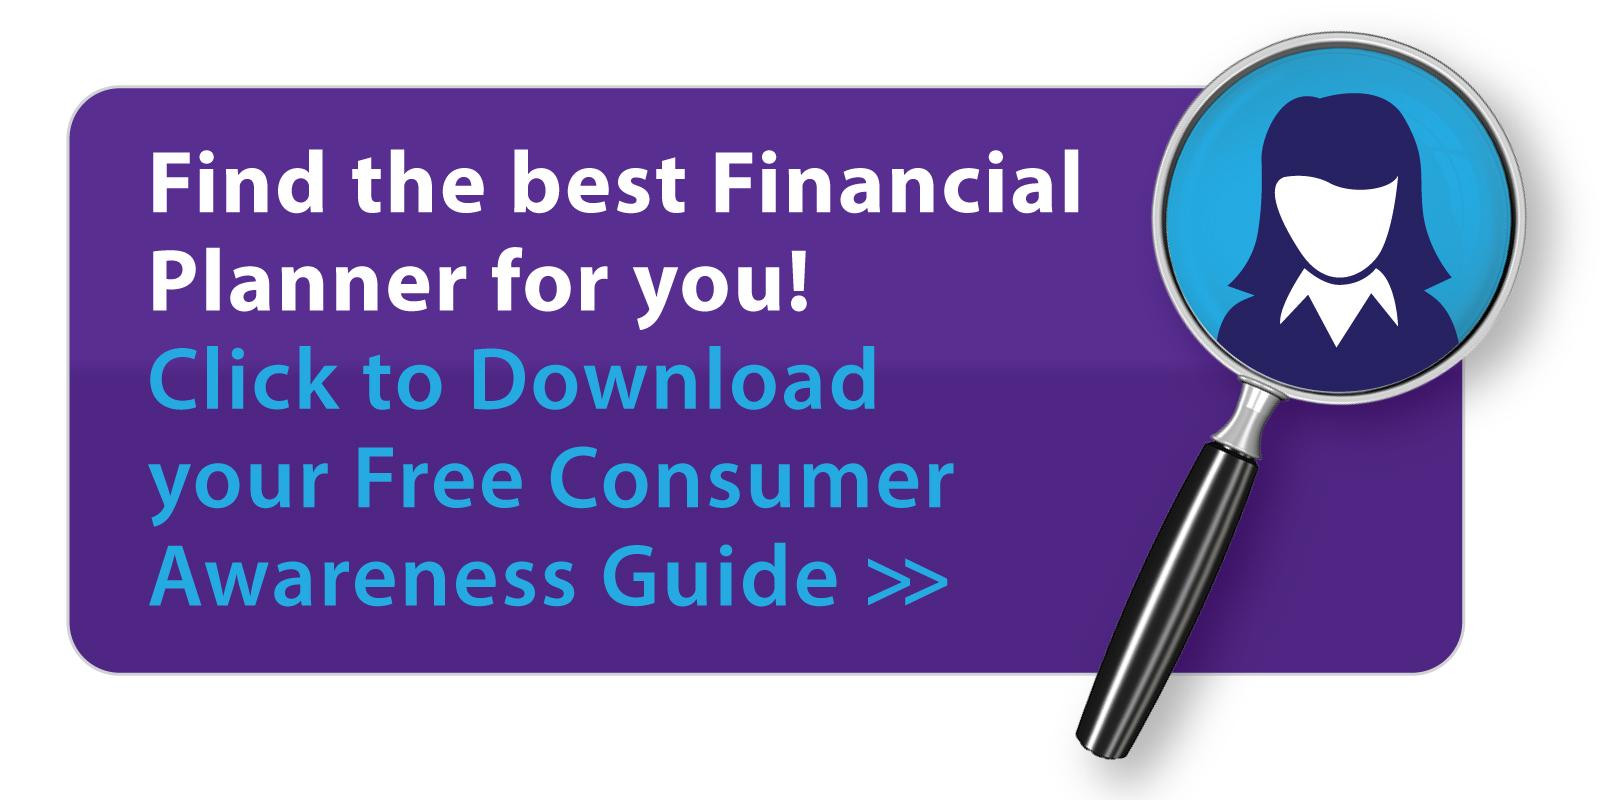 Best-financial-planner-3.jpg